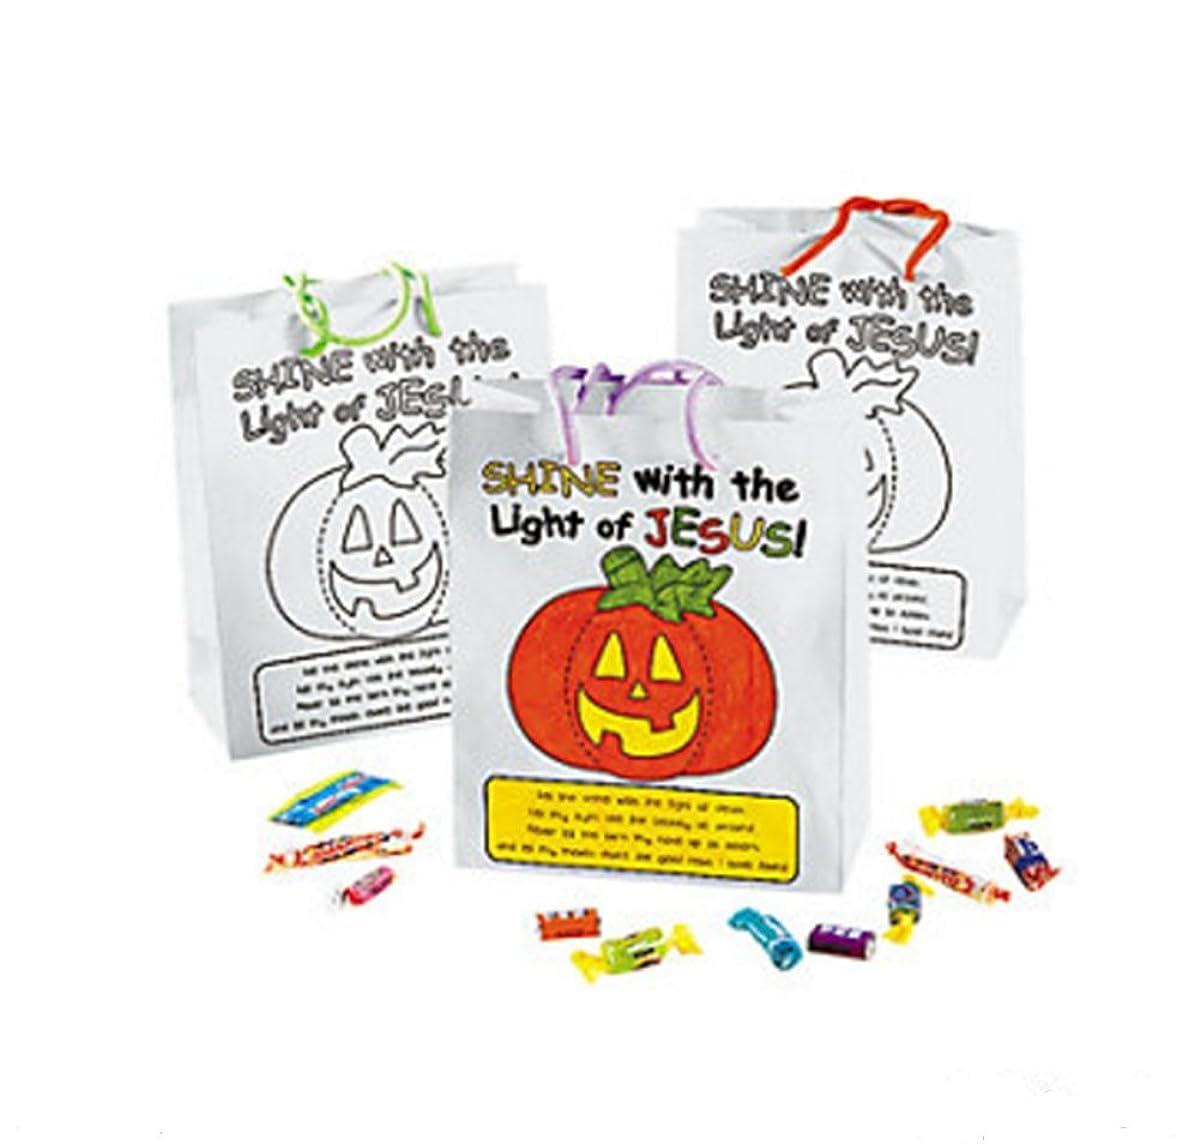 Color Your Own Christian Pumpkin Gift Bags (1 Dozen)